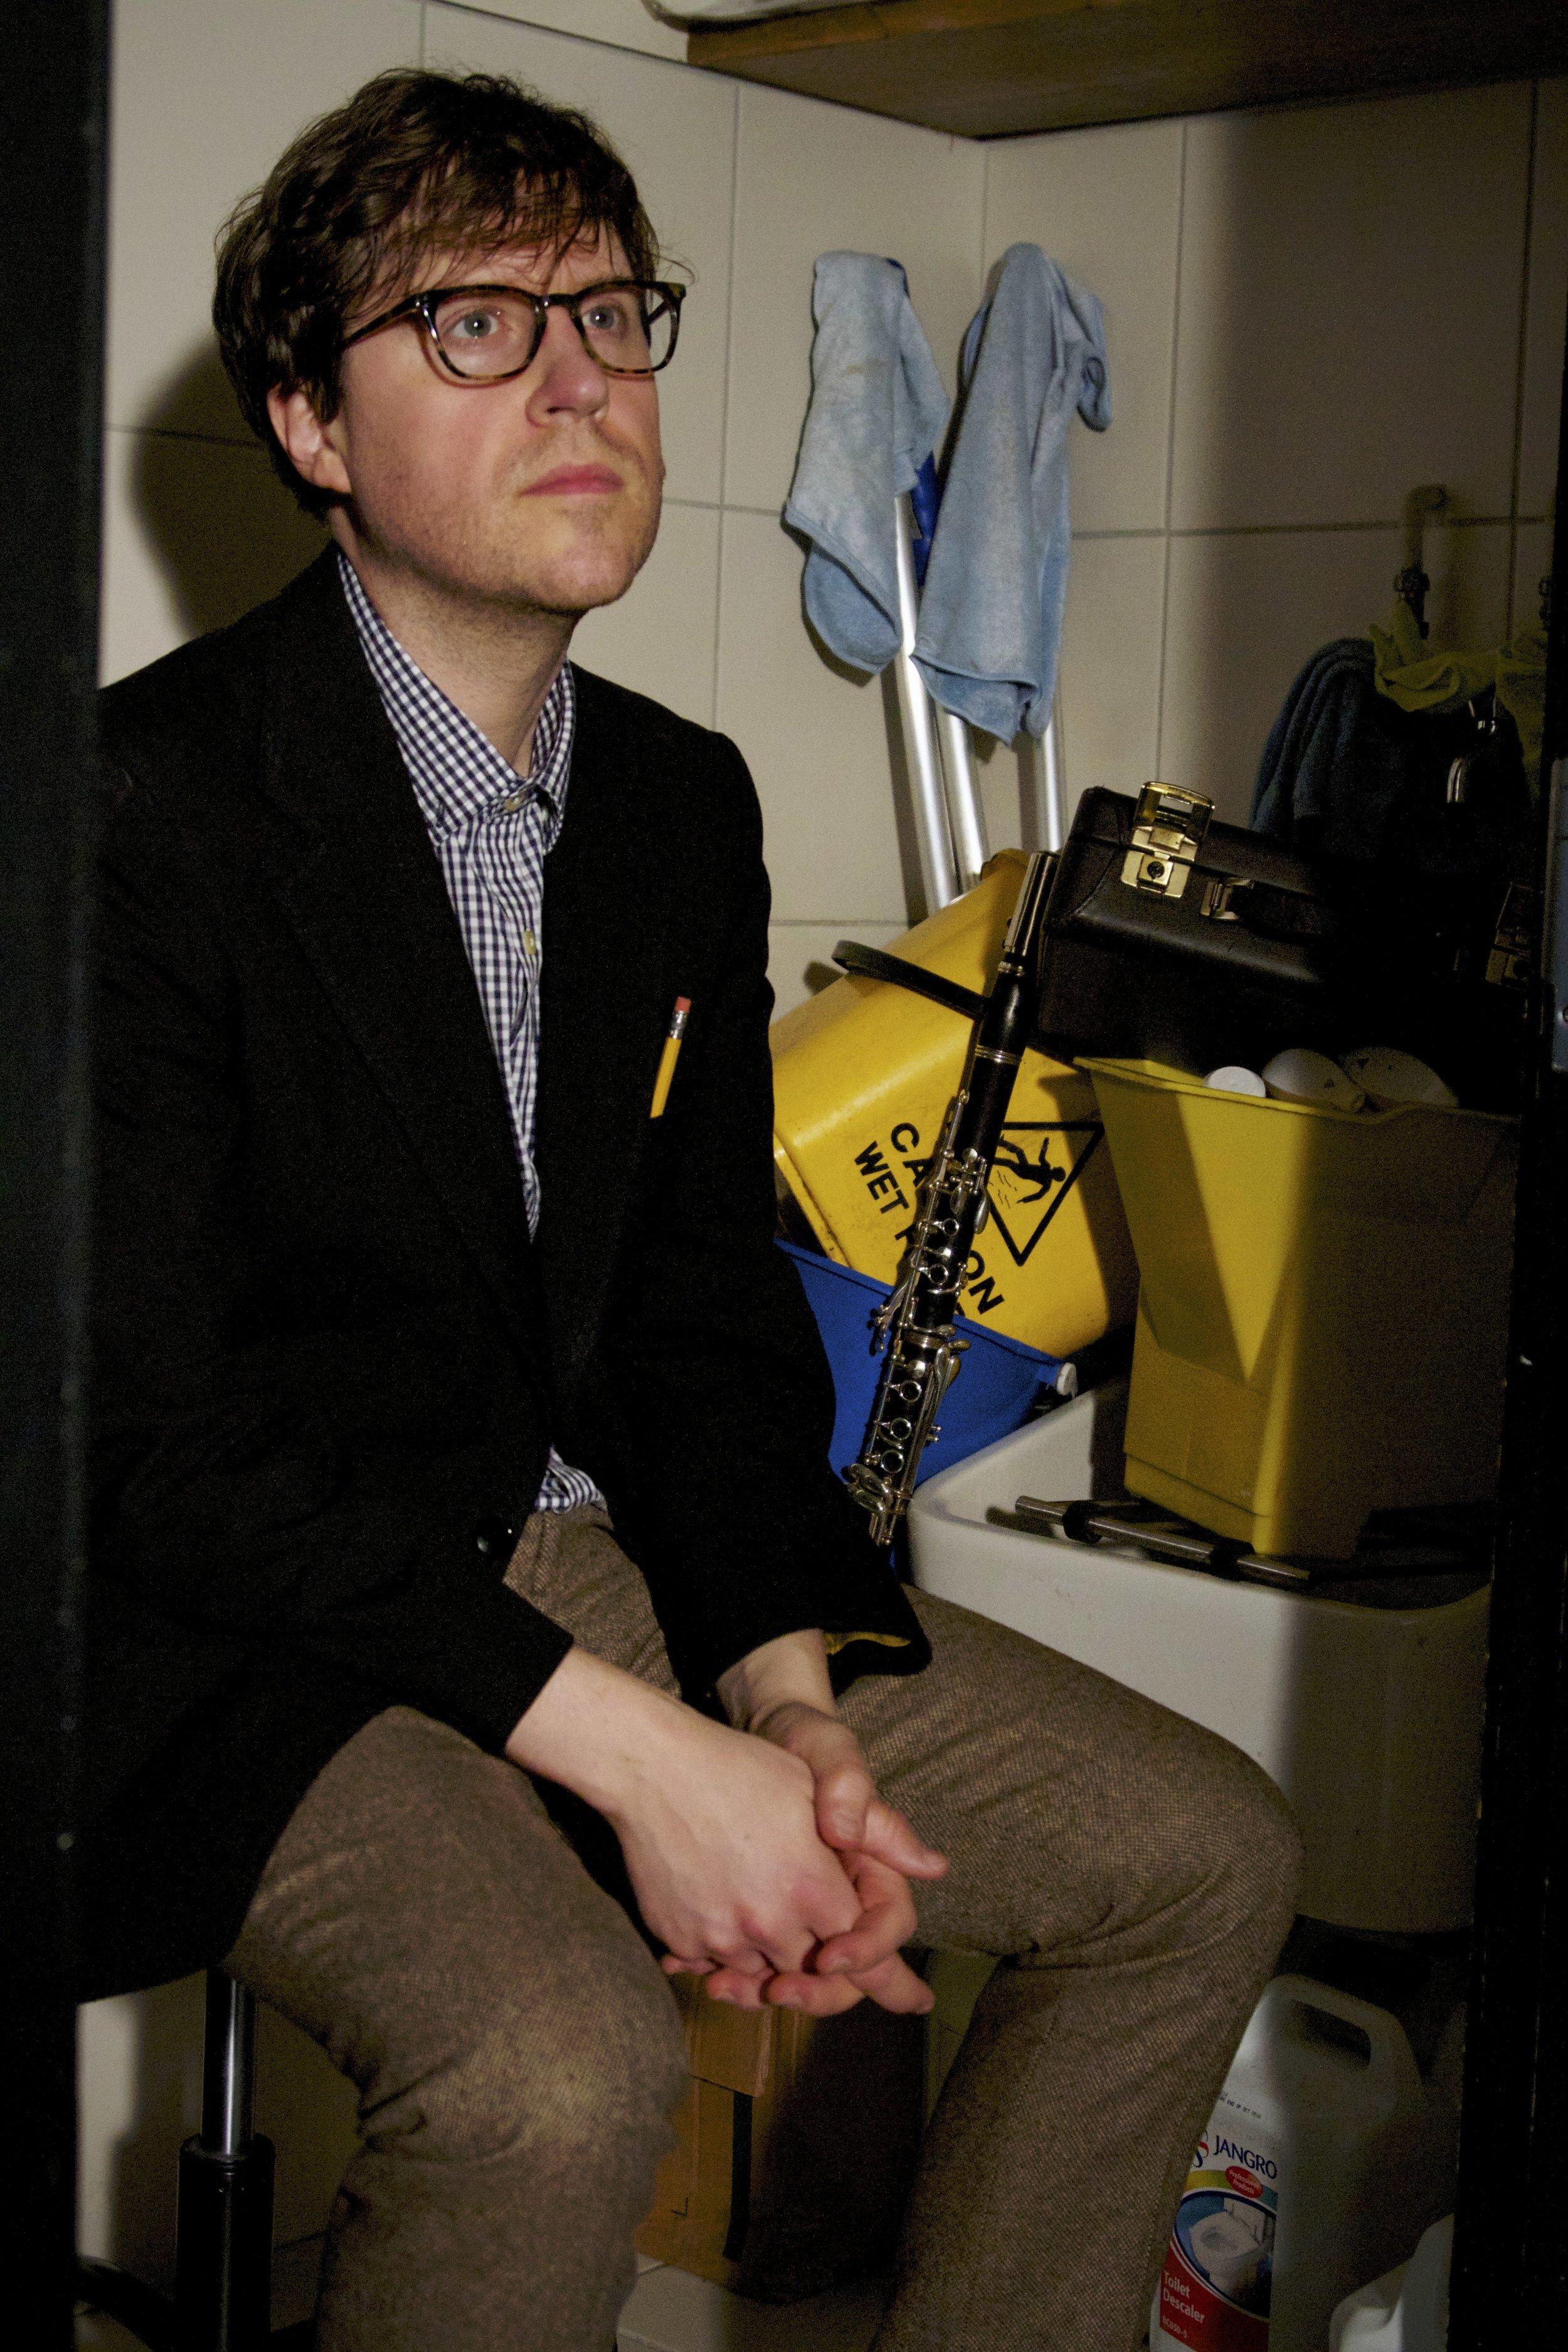 The Janitor by Joe Edwards